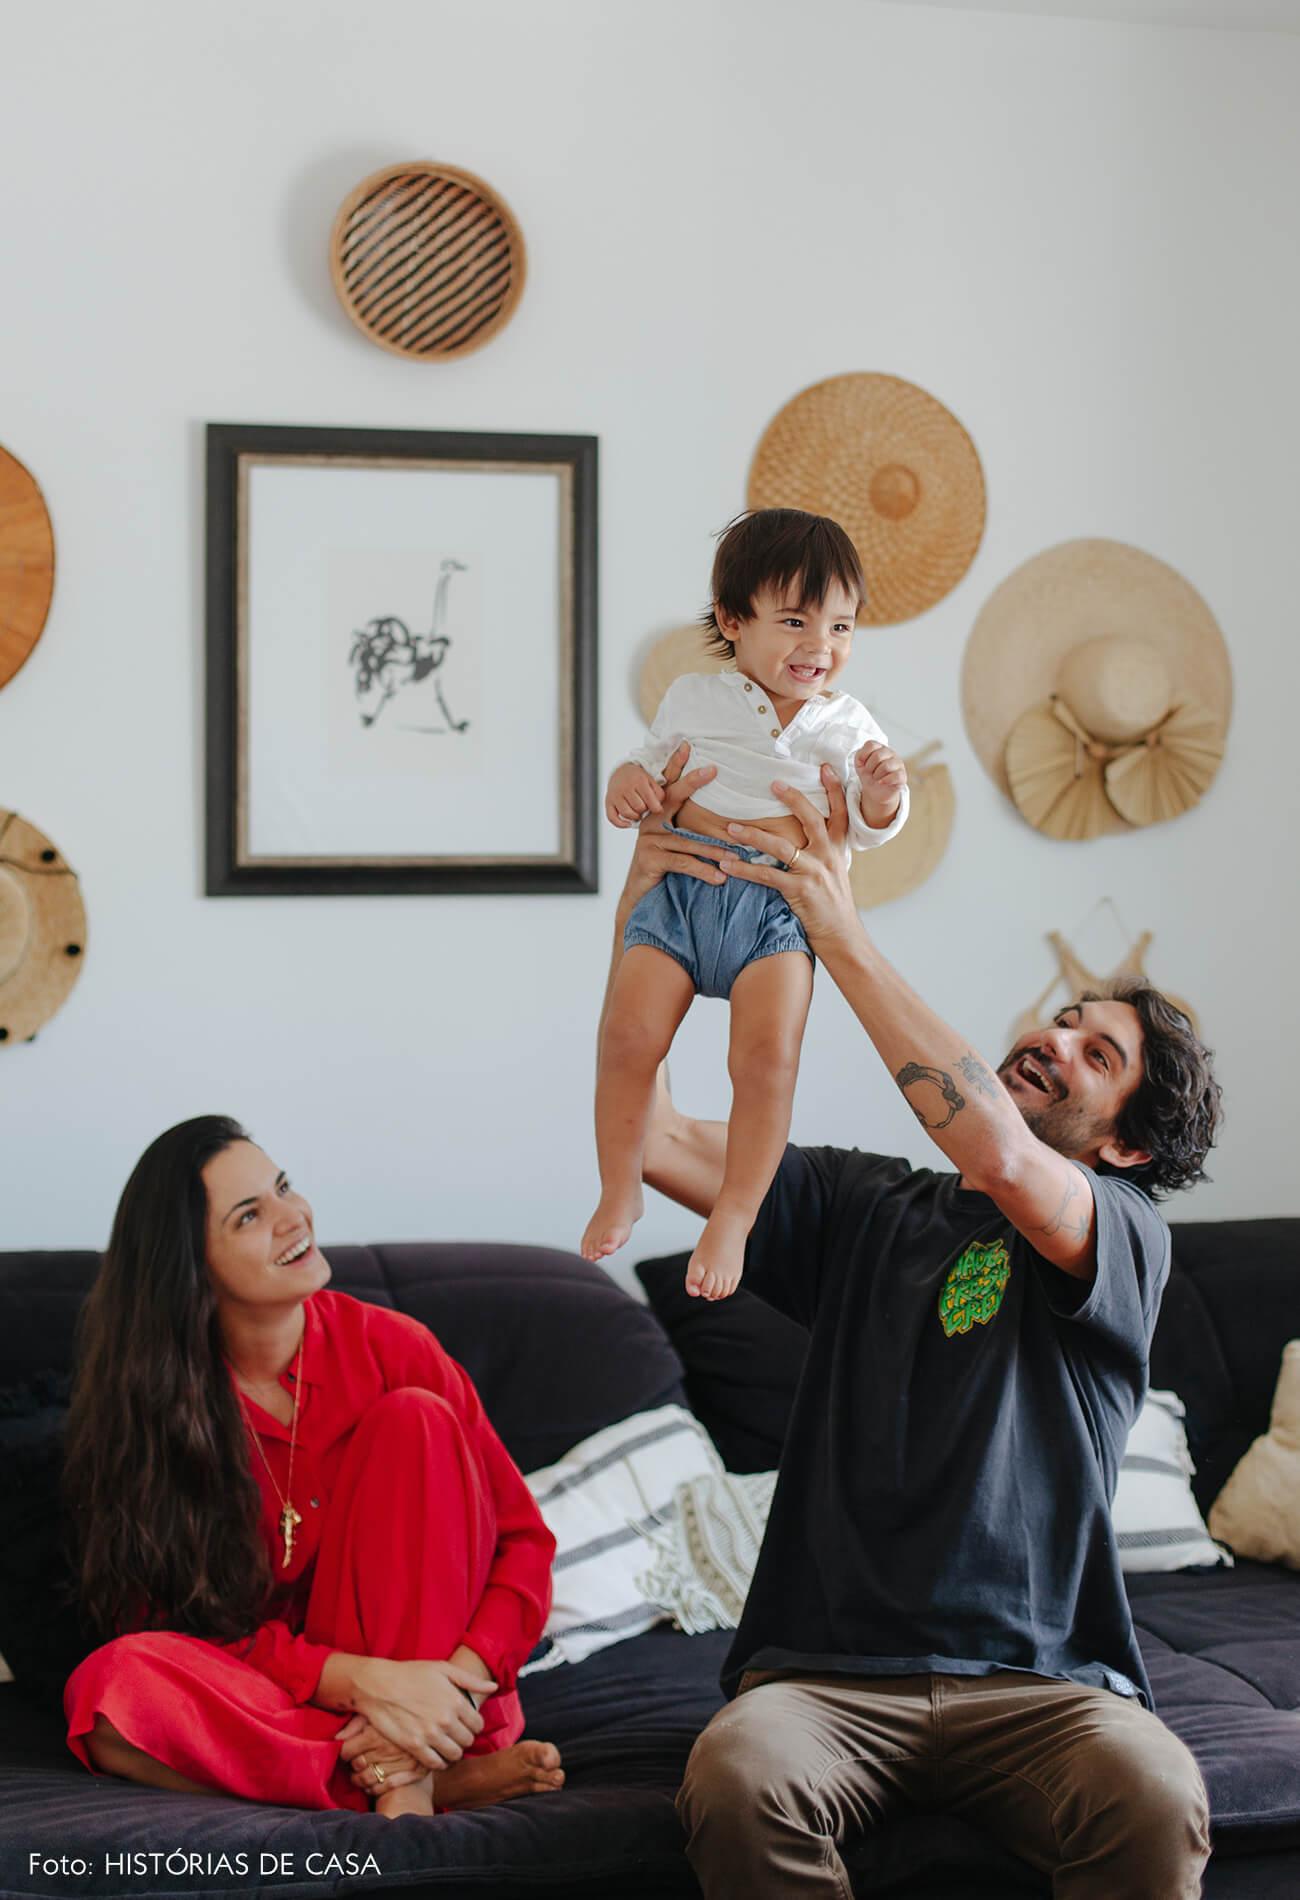 Apartamento da chef Renata Vanzetto e seu filho Ziggy